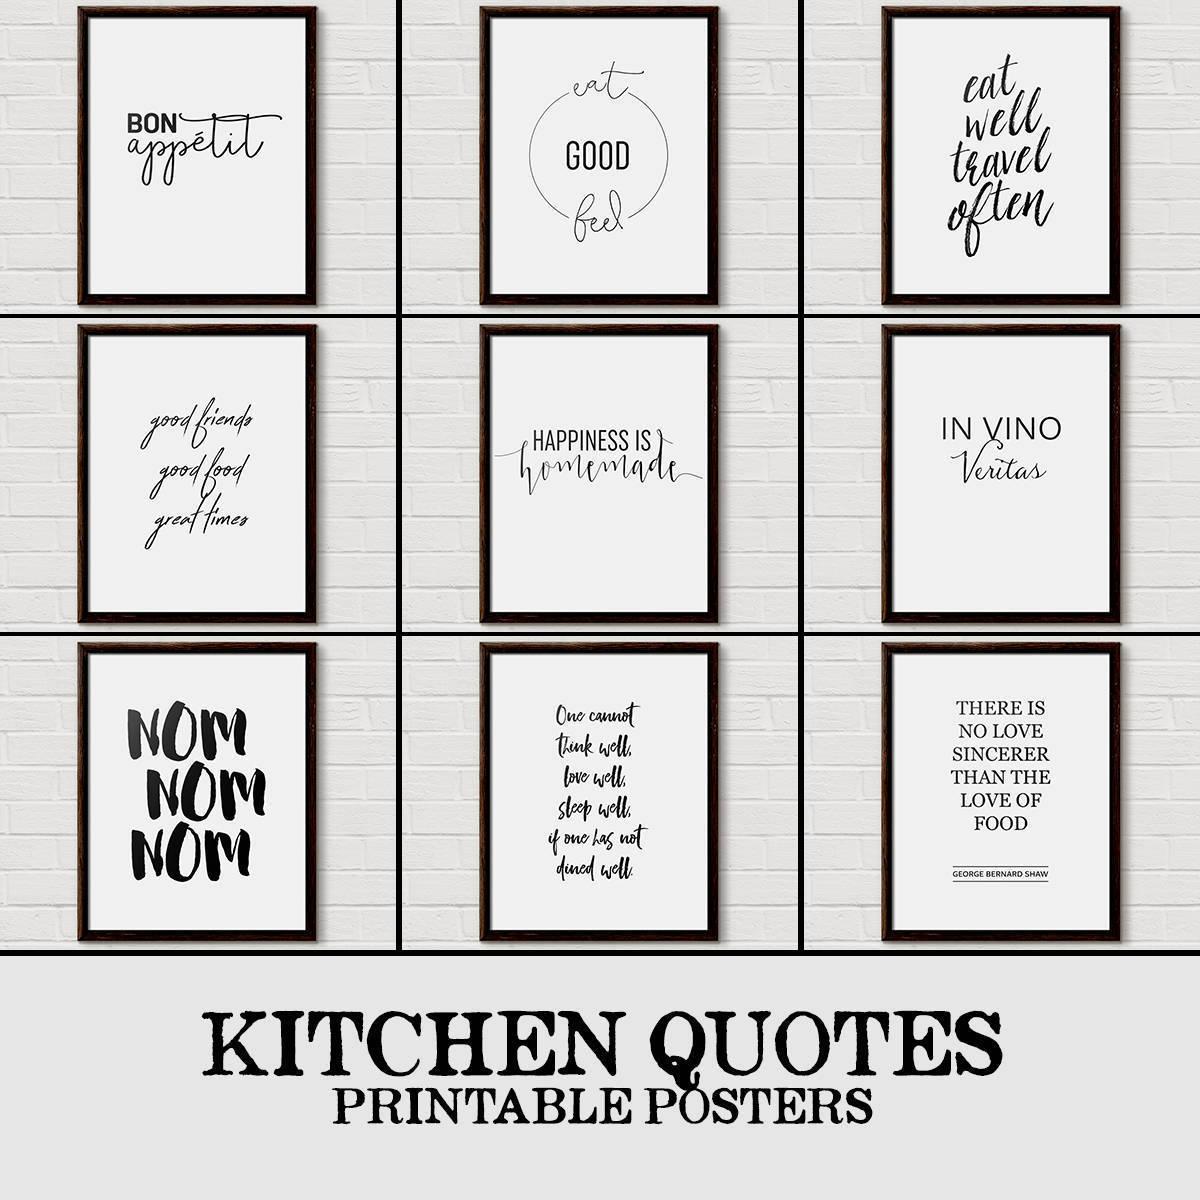 Kitchen Quote, Kitchen Wall Art, Kitchen Decor, Messy